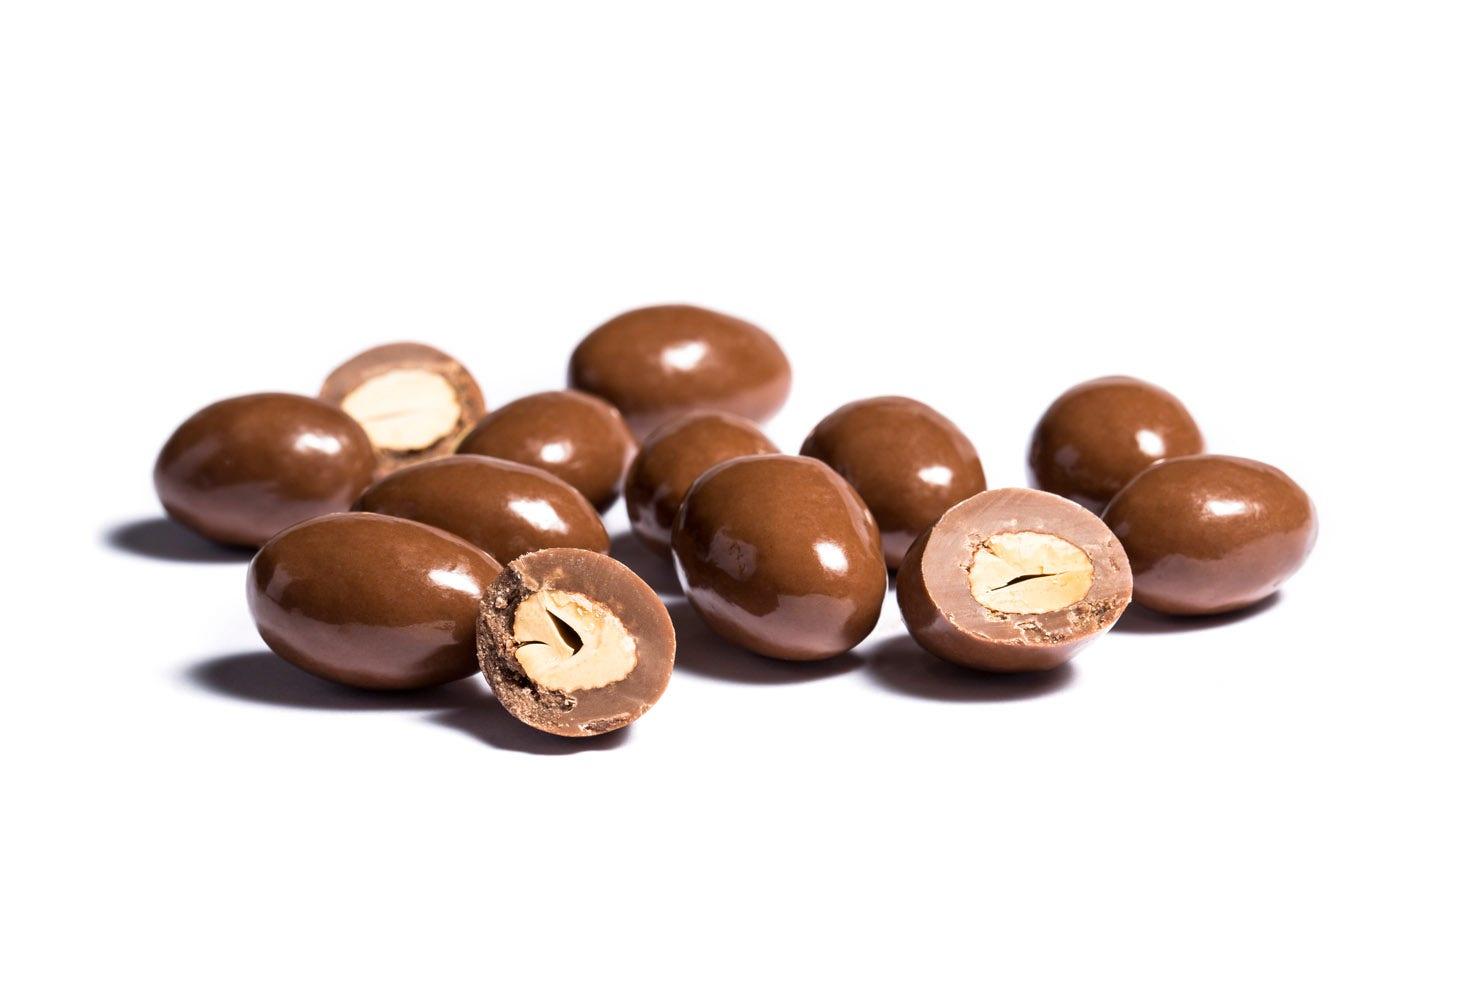 Milk Scorched Almonds